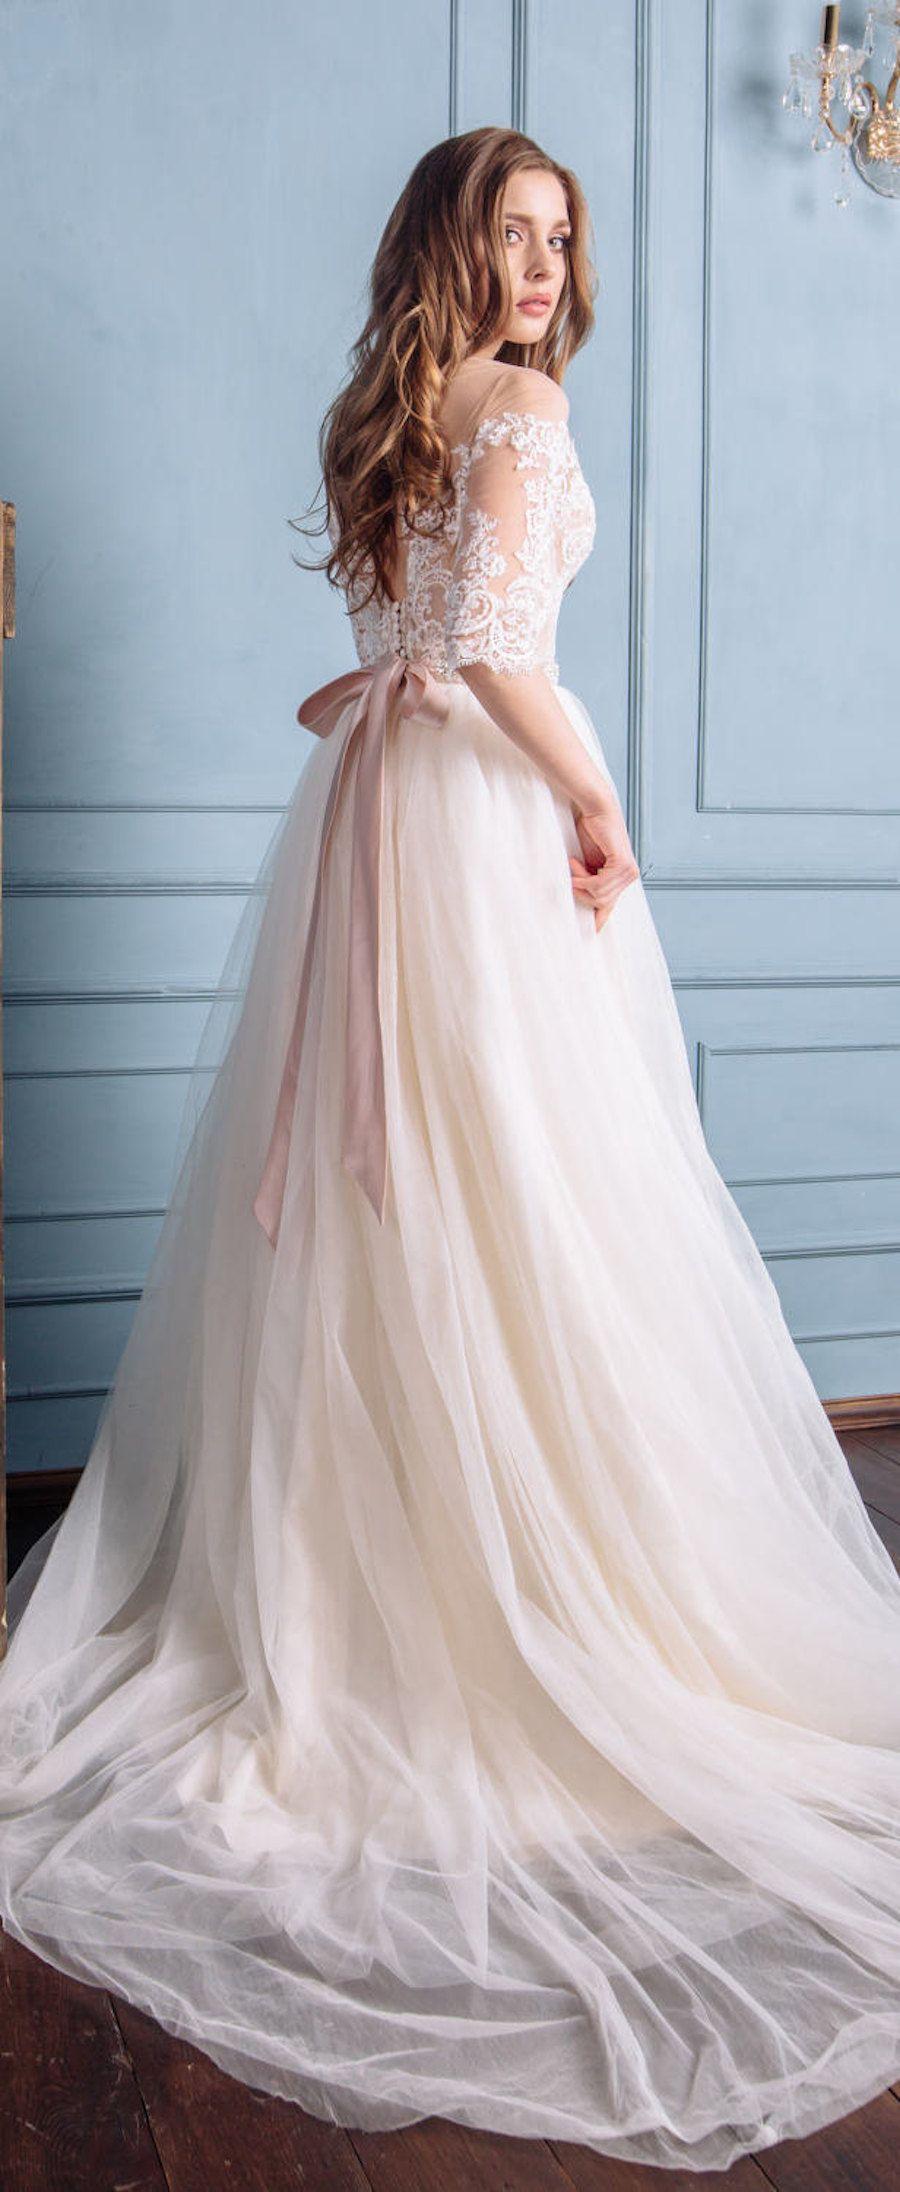 20 Fabulous Wedding Dresses You Can Buy On Etsy Belle The Magazine Etsy Wedding Dress Boho Wedding Dress Fairy Wedding Dress